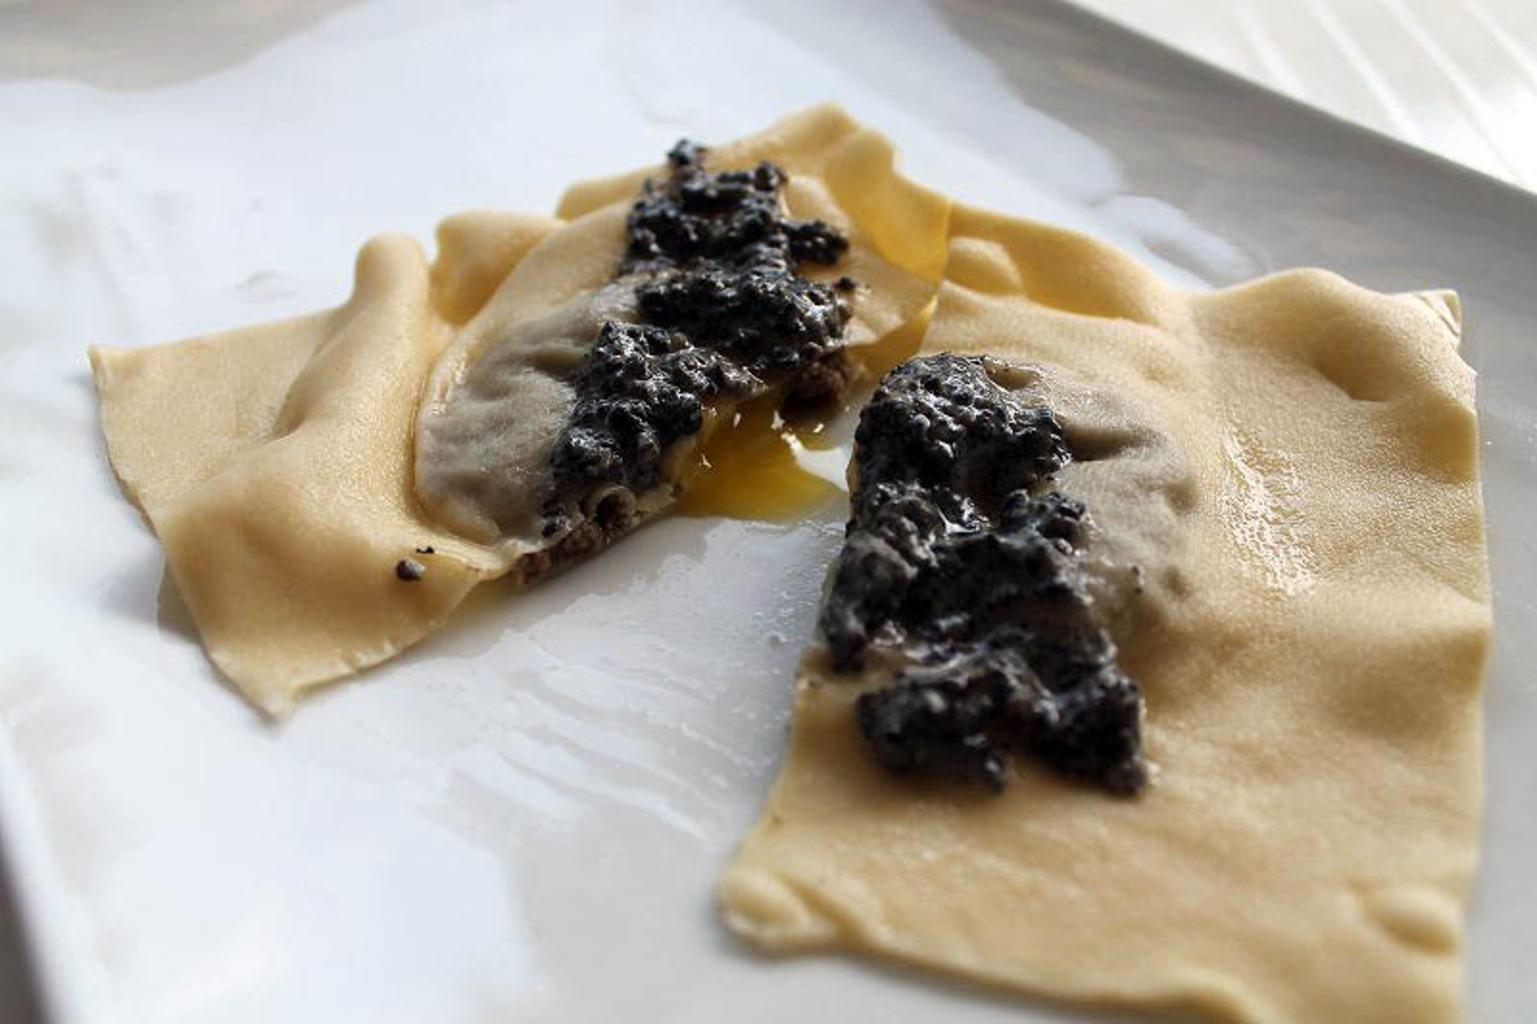 Ricetta Ravioli Con Uovo.Pib66mzivkv1zm